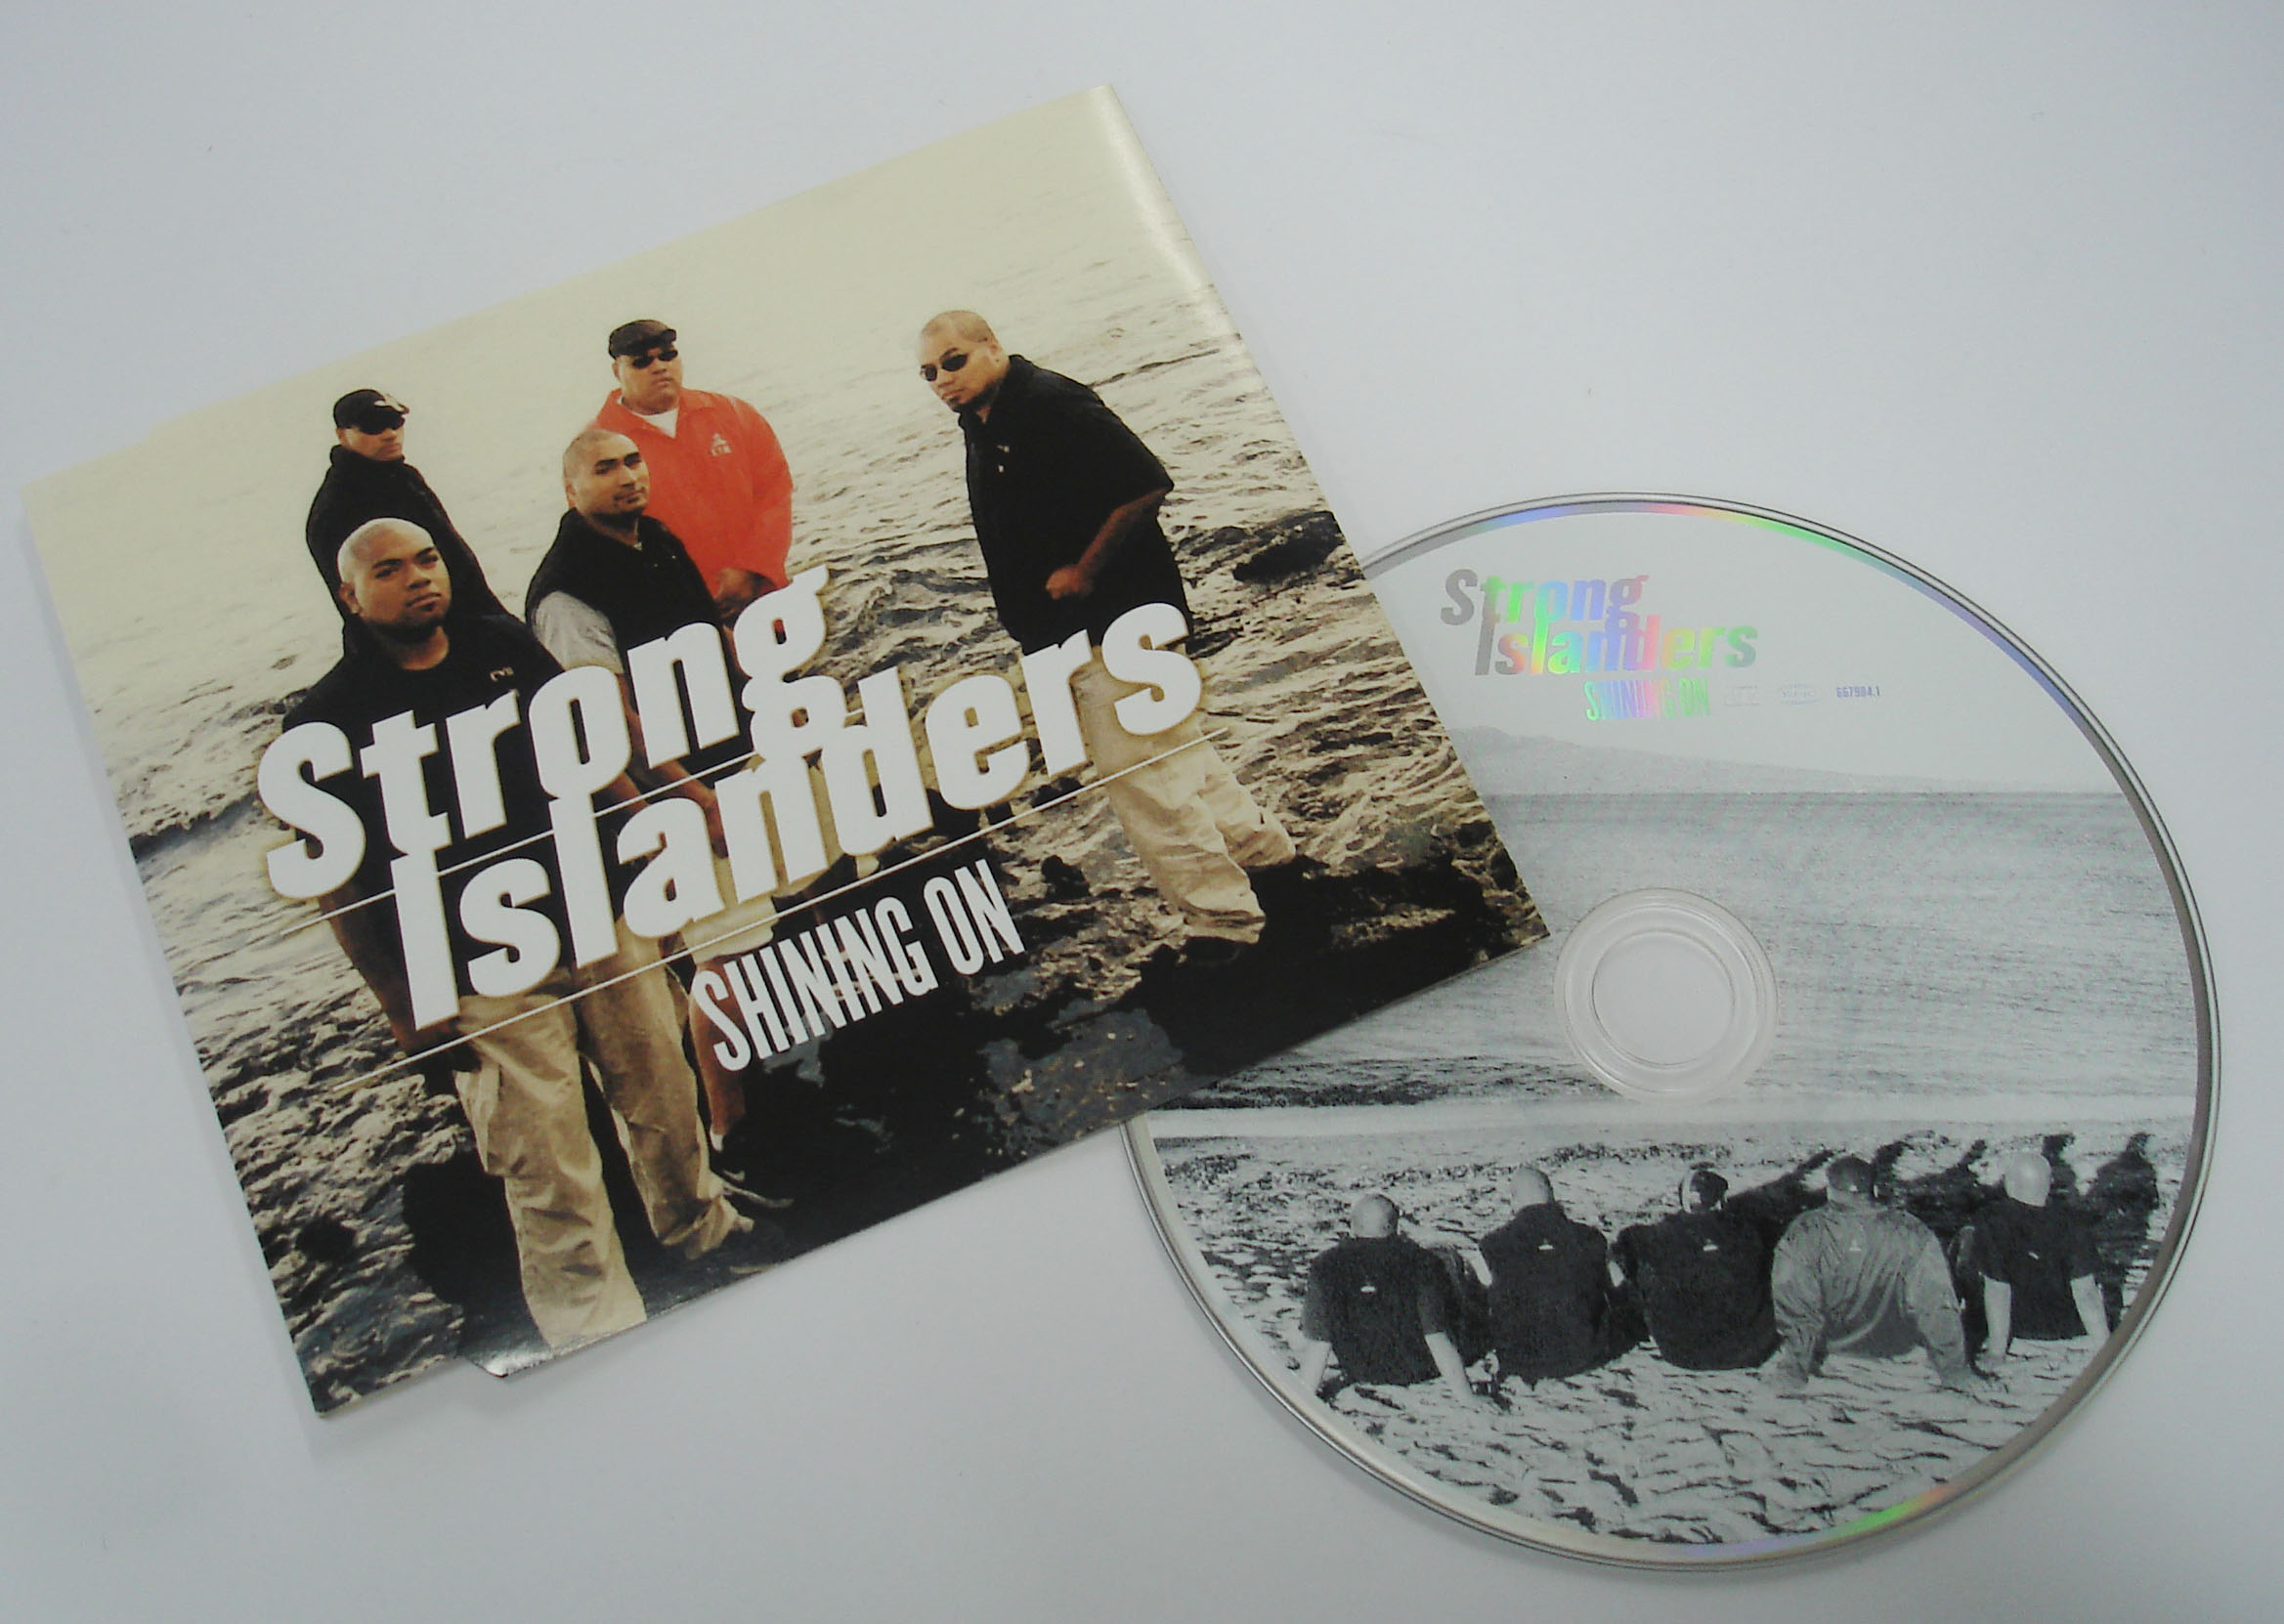 STRONG ISLANDERS - SHINING ON - SINGLE